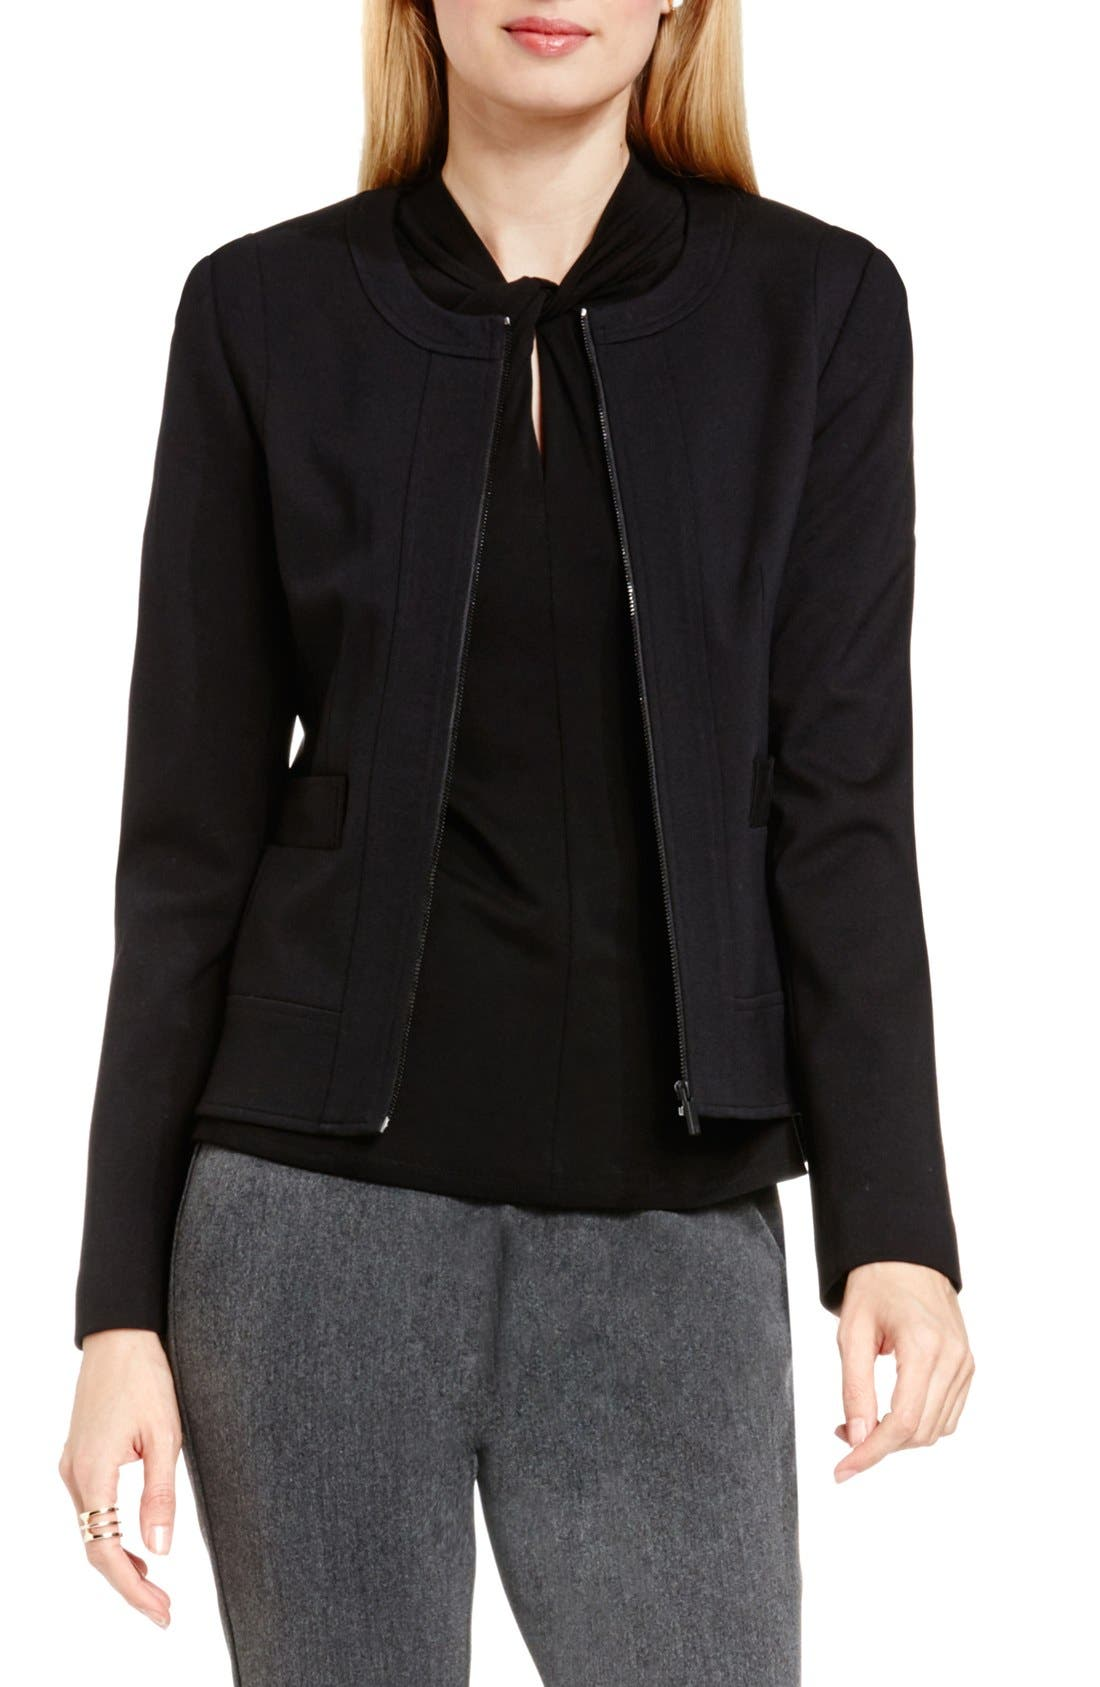 Vince Camuto Front Zip Collarless Jacket (Regular & Petite)